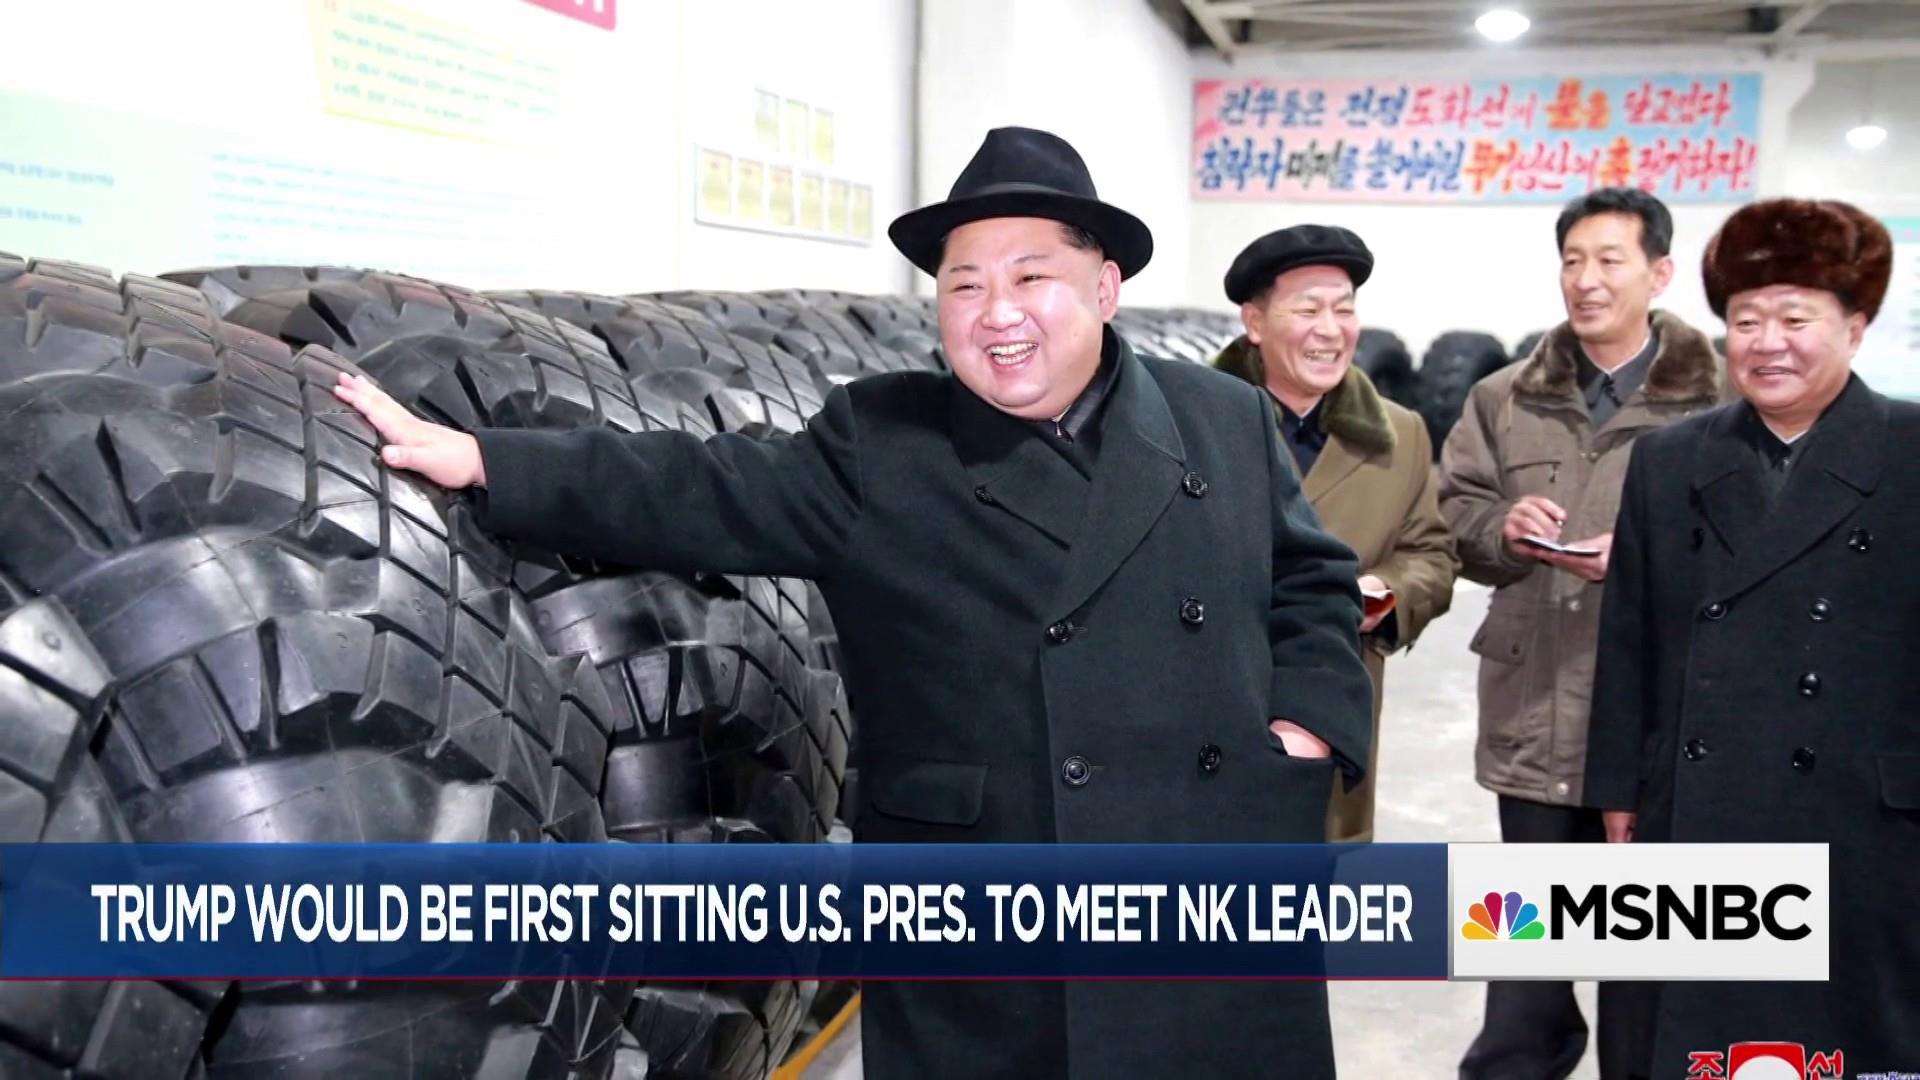 WH sends mixed messages on Trump, Kim Jong-Un meeting